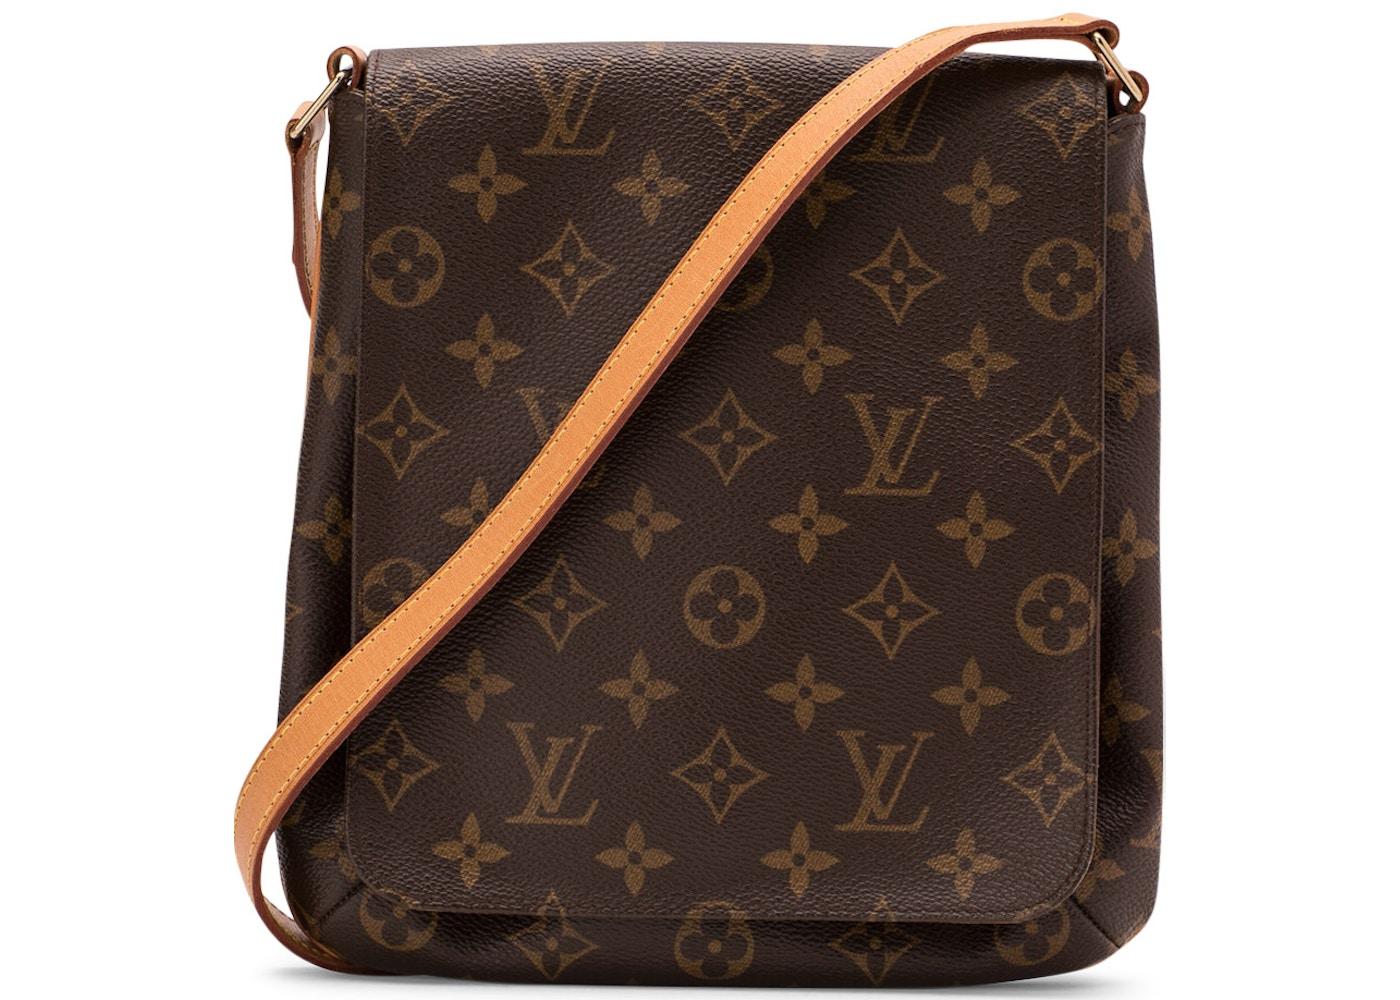 a86d3ff2fc4f Louis Vuitton Musette Salsa Monogram PM Brown. Monogram PM Brown